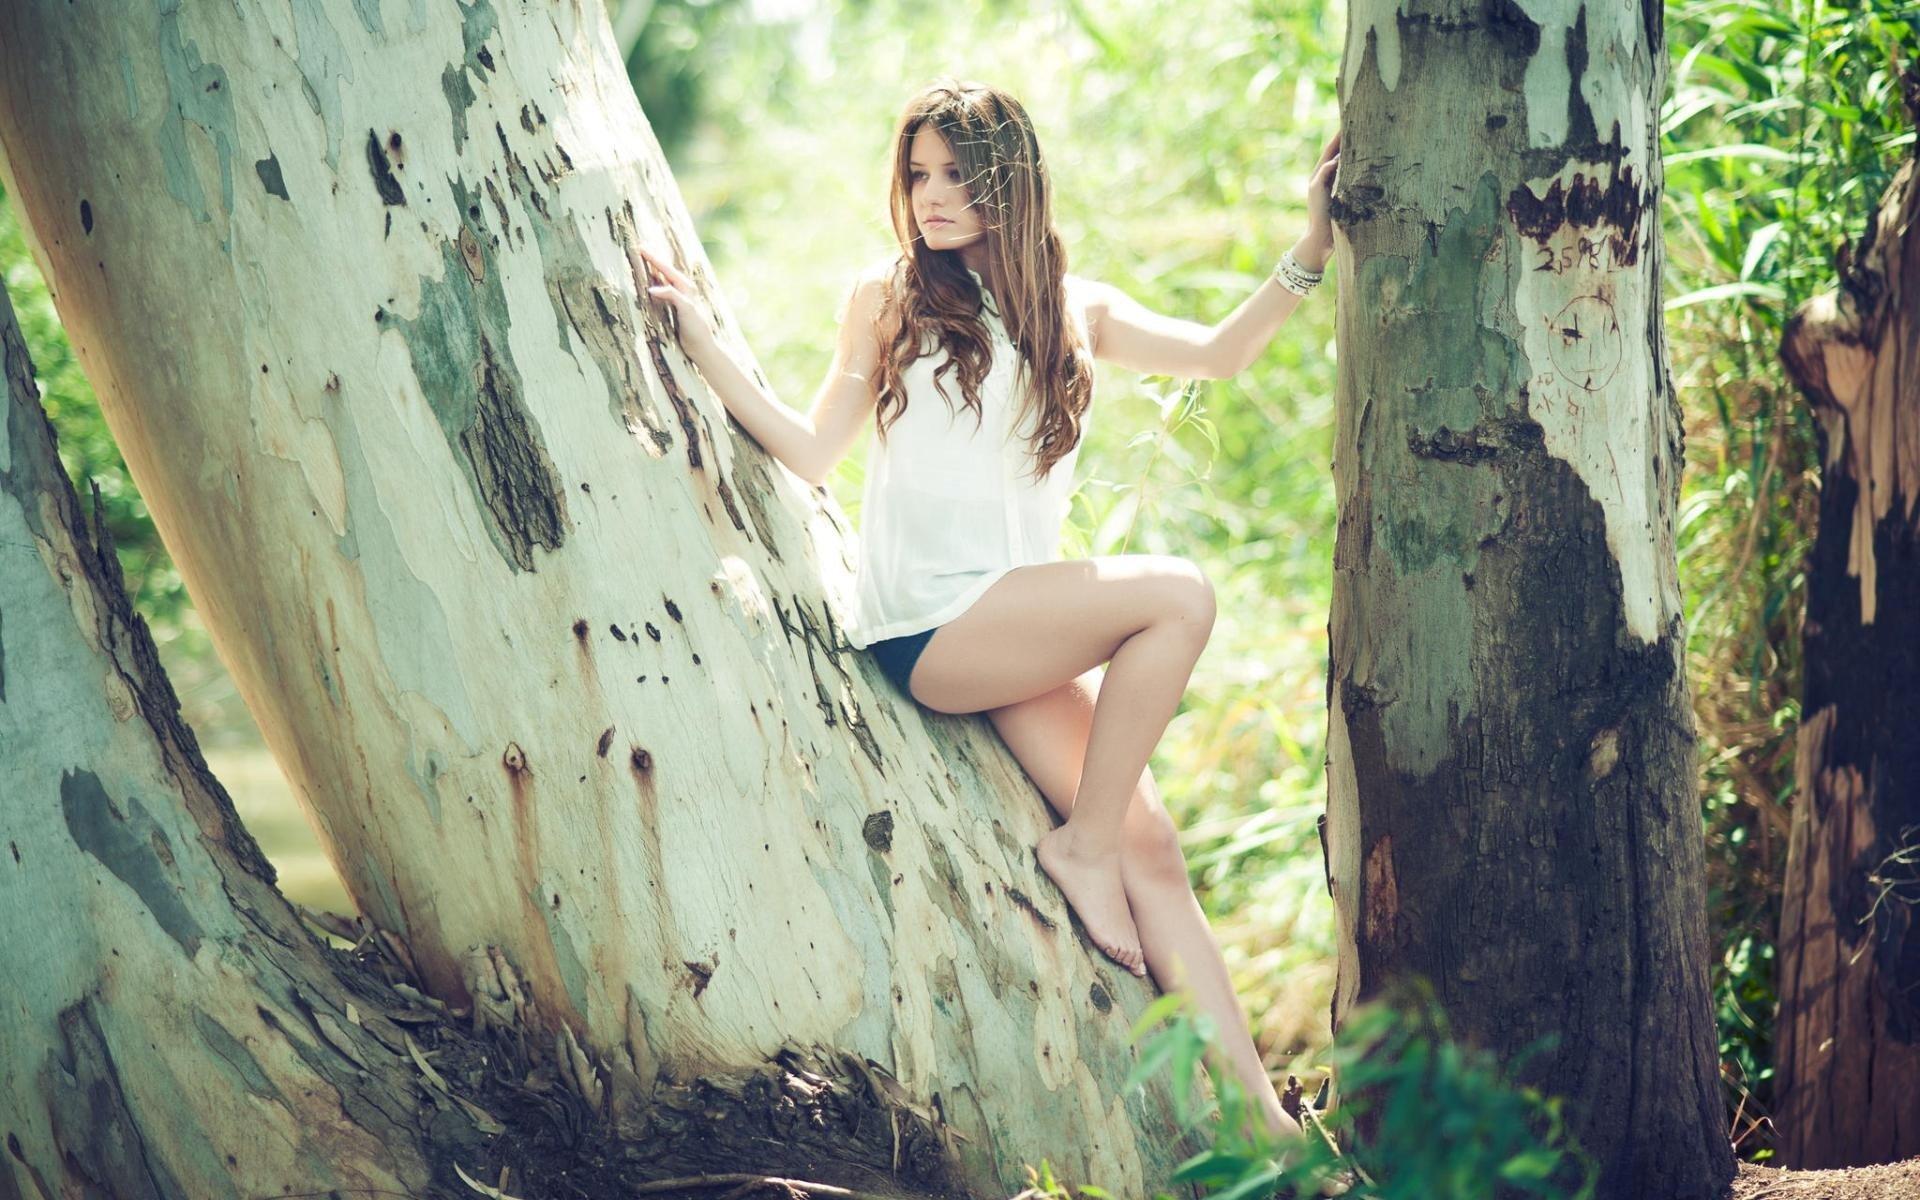 Matan Eshel, Women, Legs, Long hair, Brunette, Shorts Wallpaper